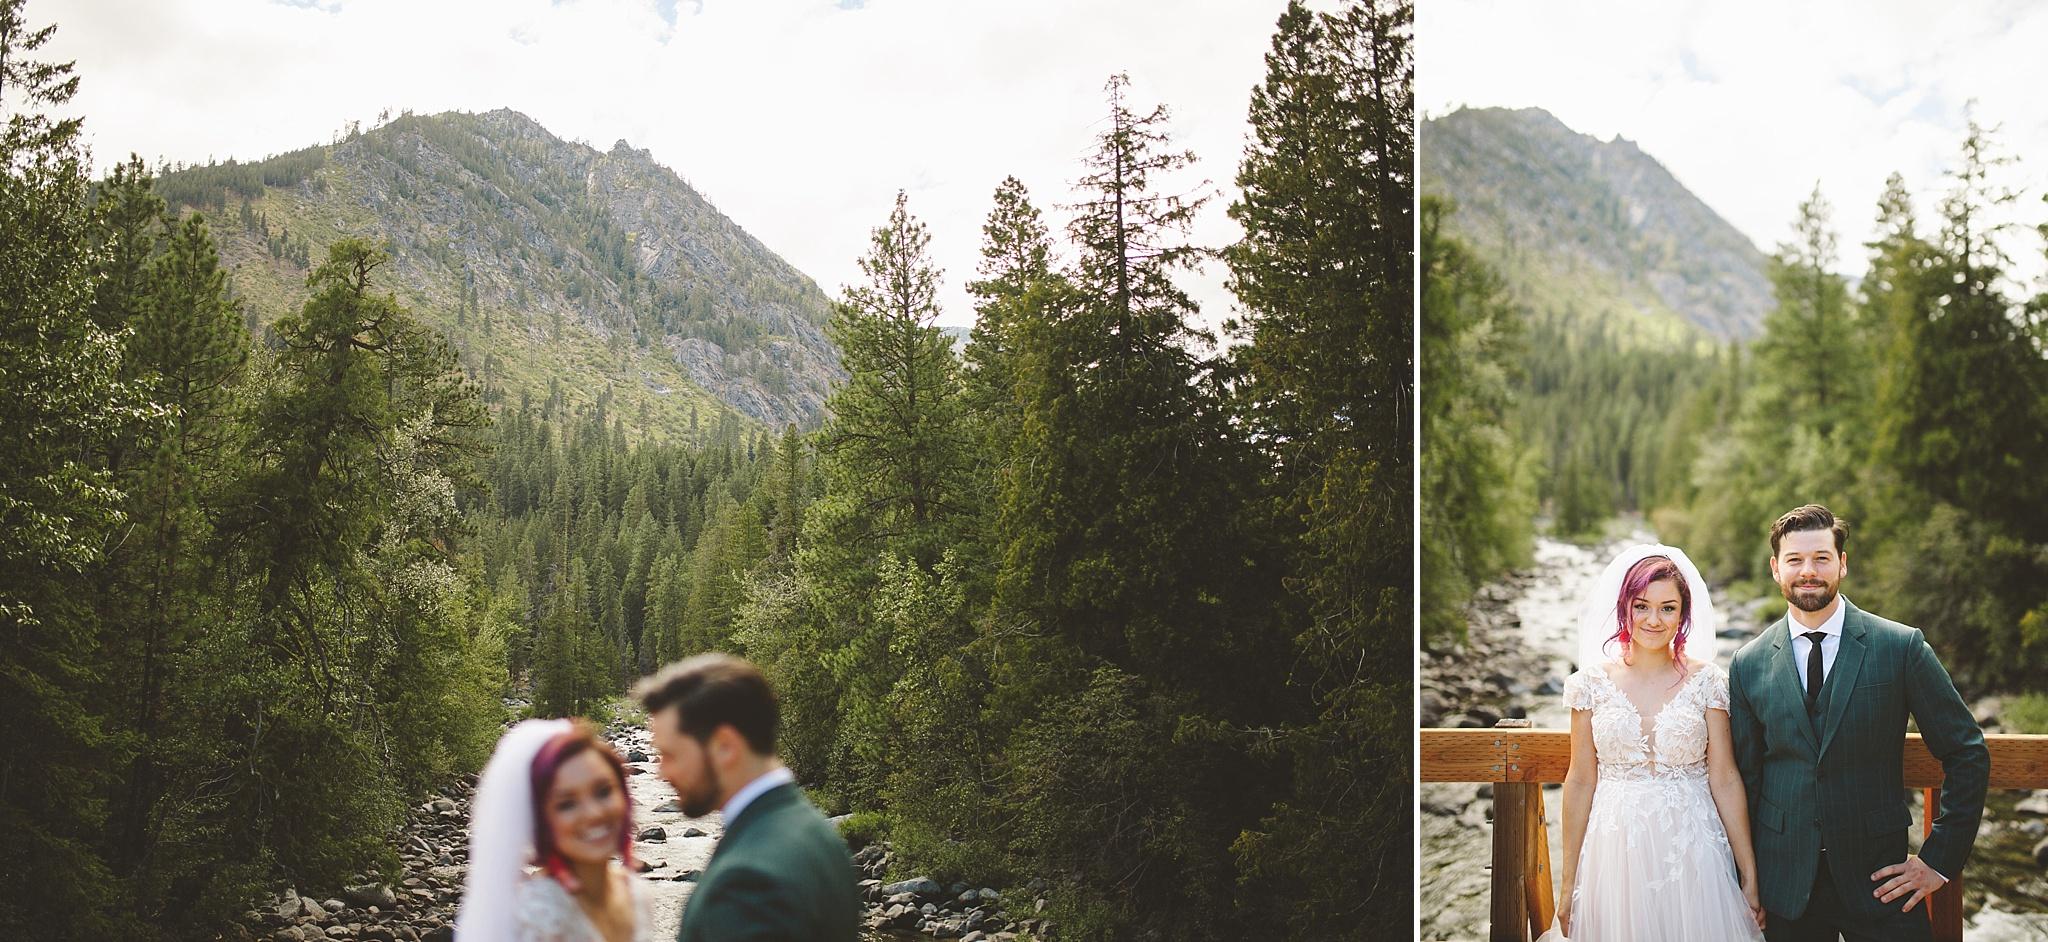 wedding in the woods of washington